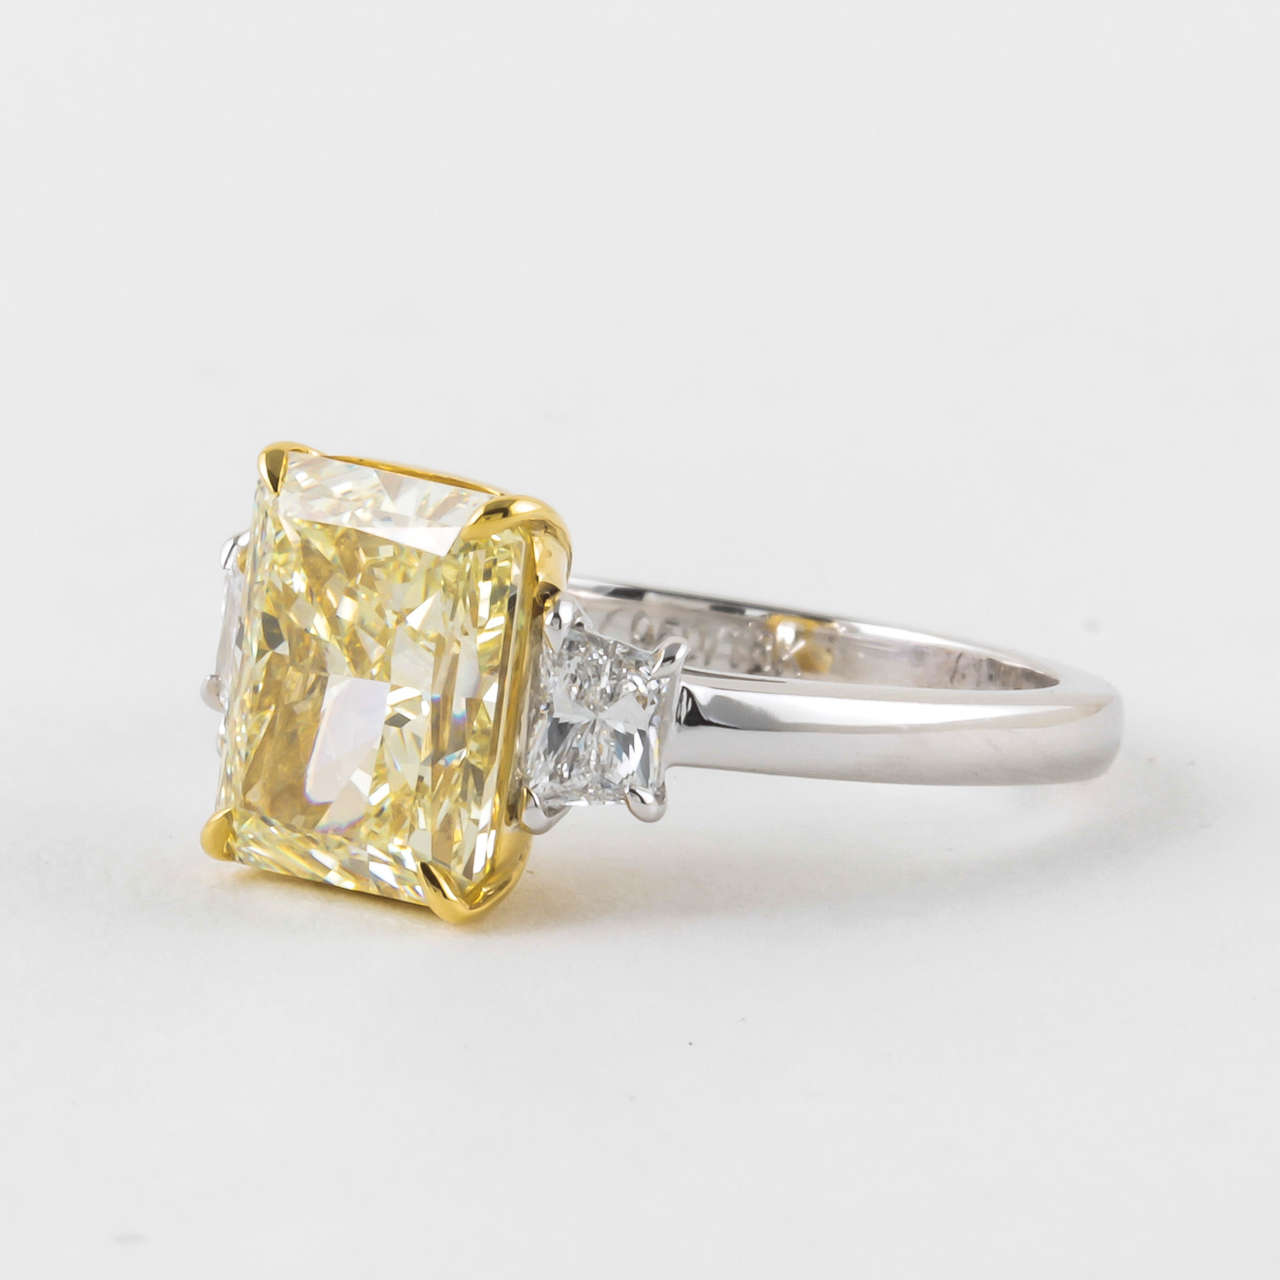 4 carat GIA certified Fancy Light Yellow VVS1 Diamond Ring image 5